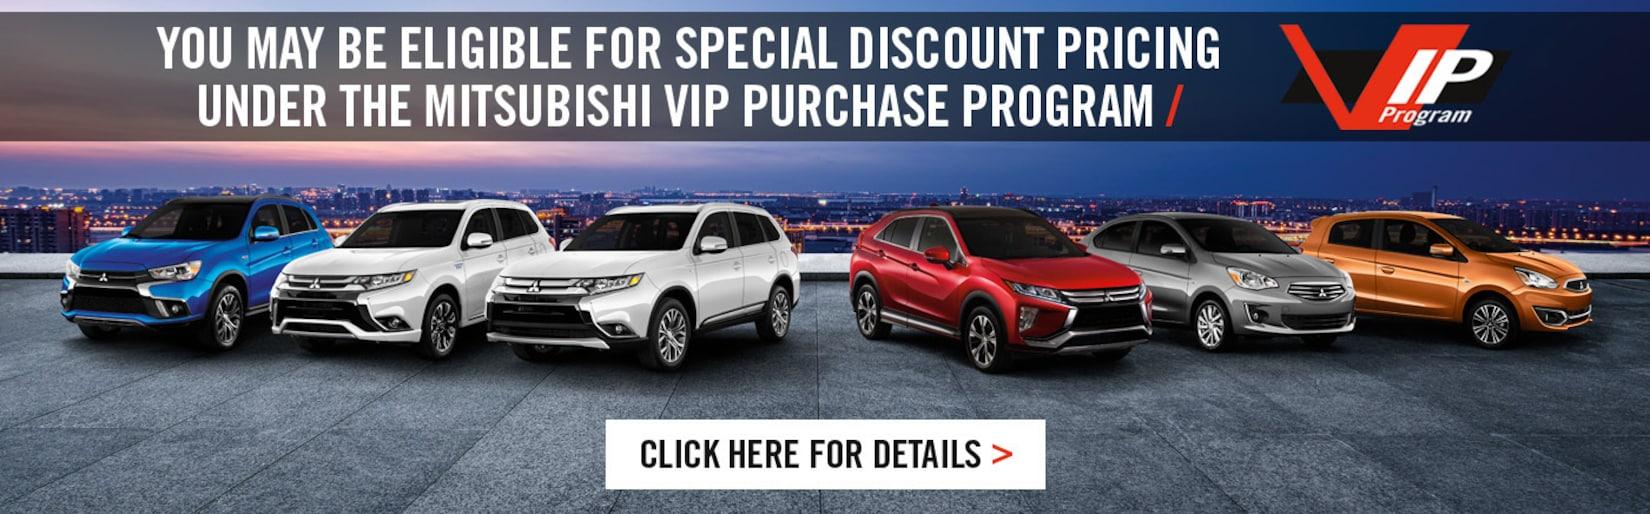 Walker Mitsubishi New Mitsubishi and Used Car Dealer in Alexandria,